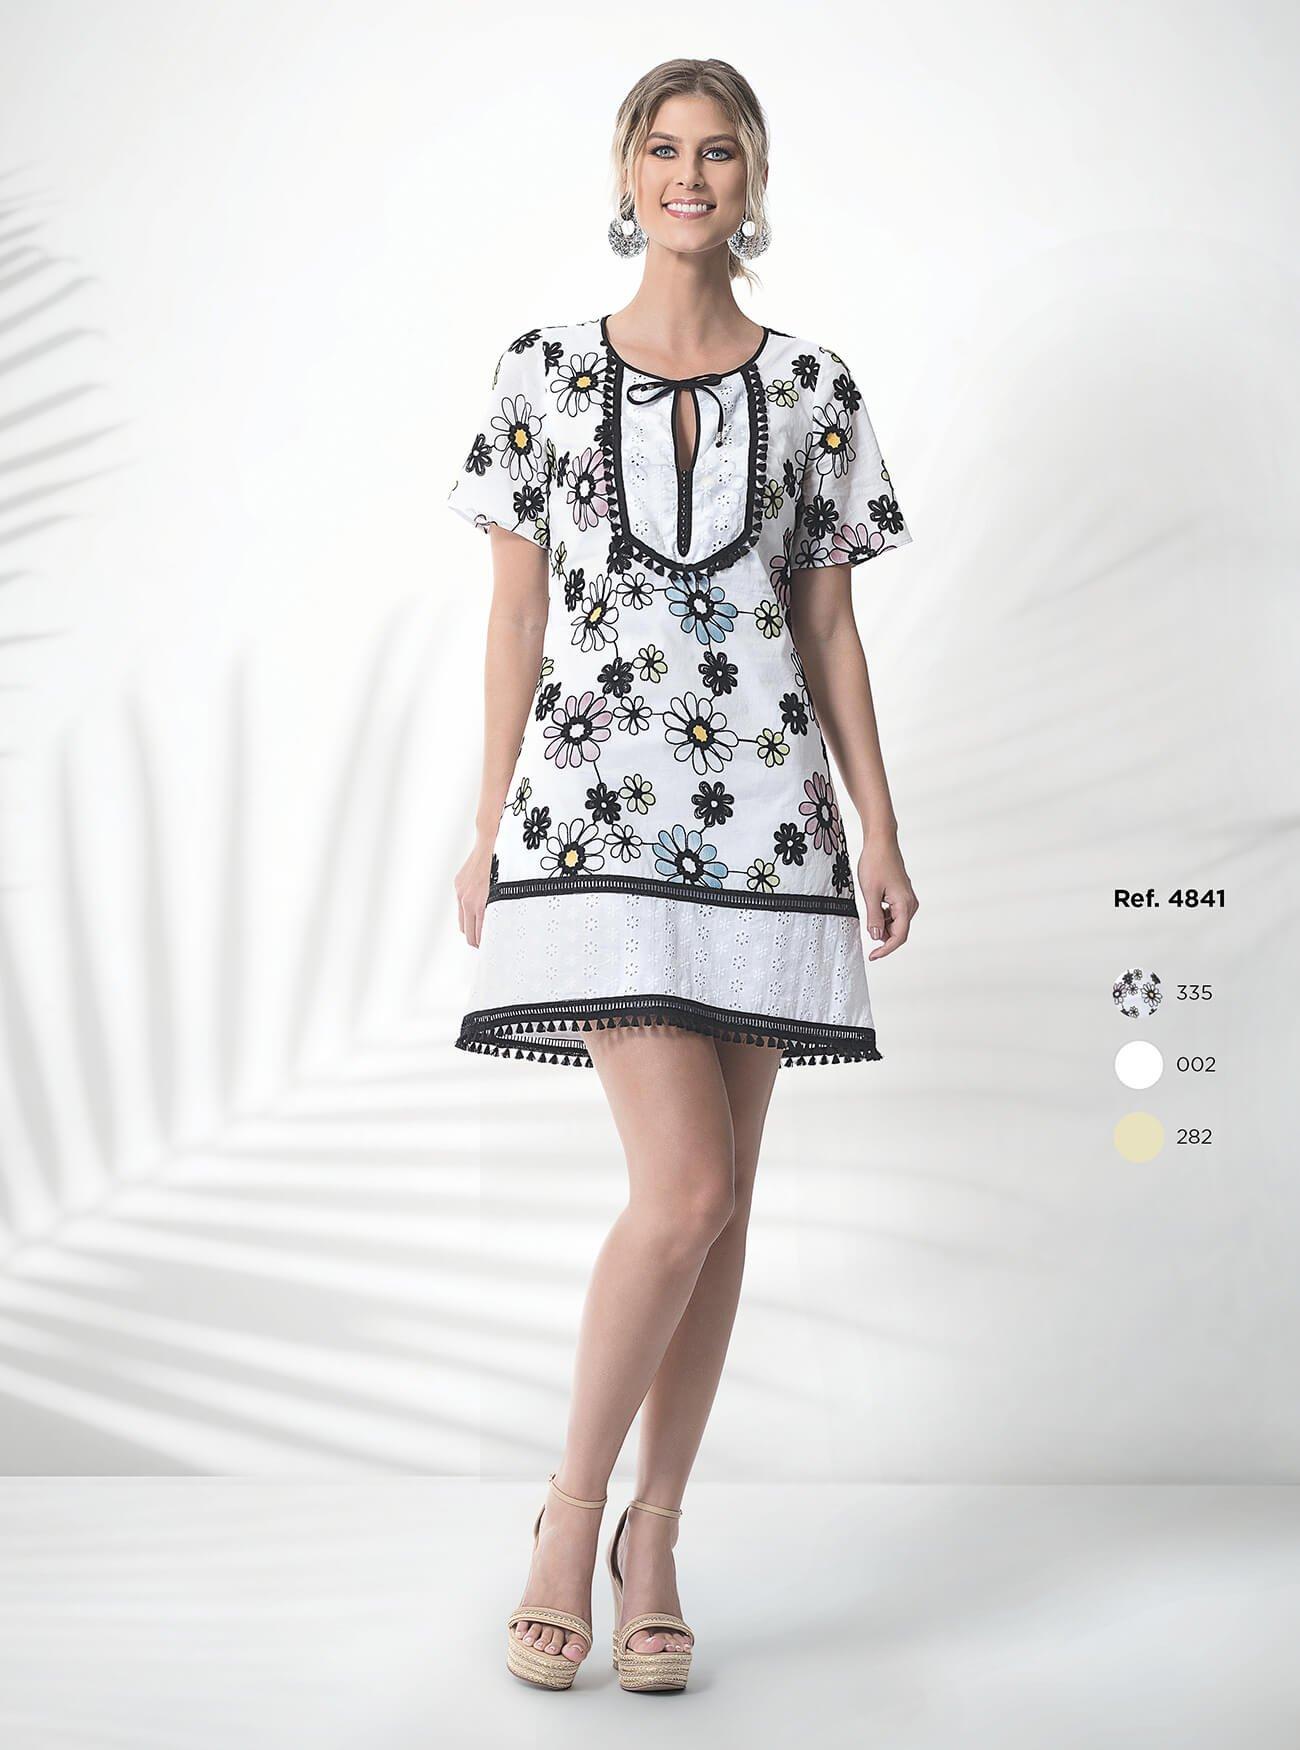 Vestido curto floral com mangas